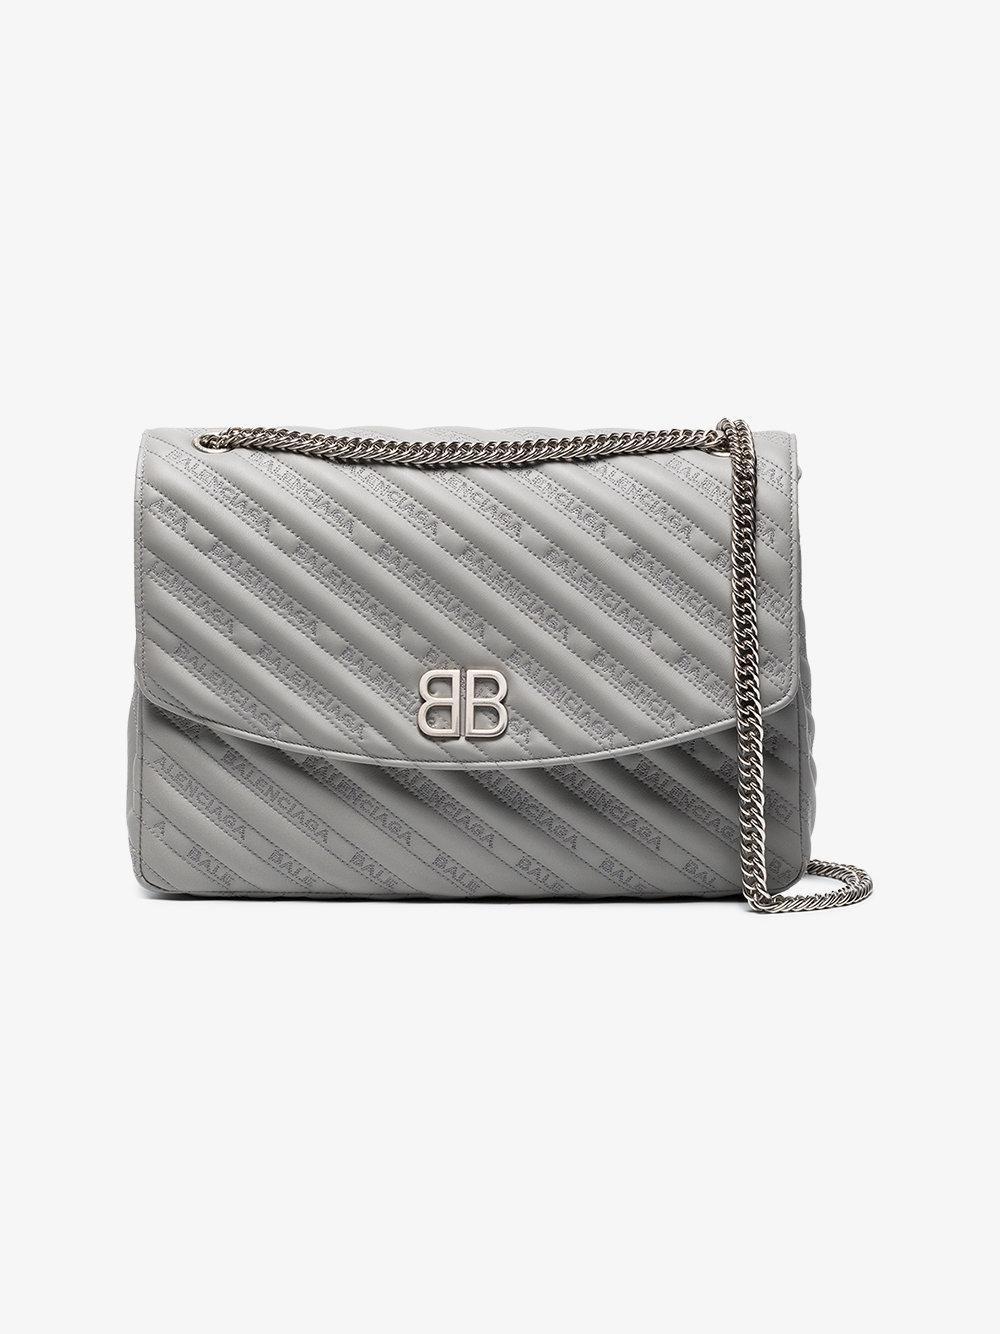 Embroidered Leather Shoulder Bag - Black Balenciaga TXQ5DDO1